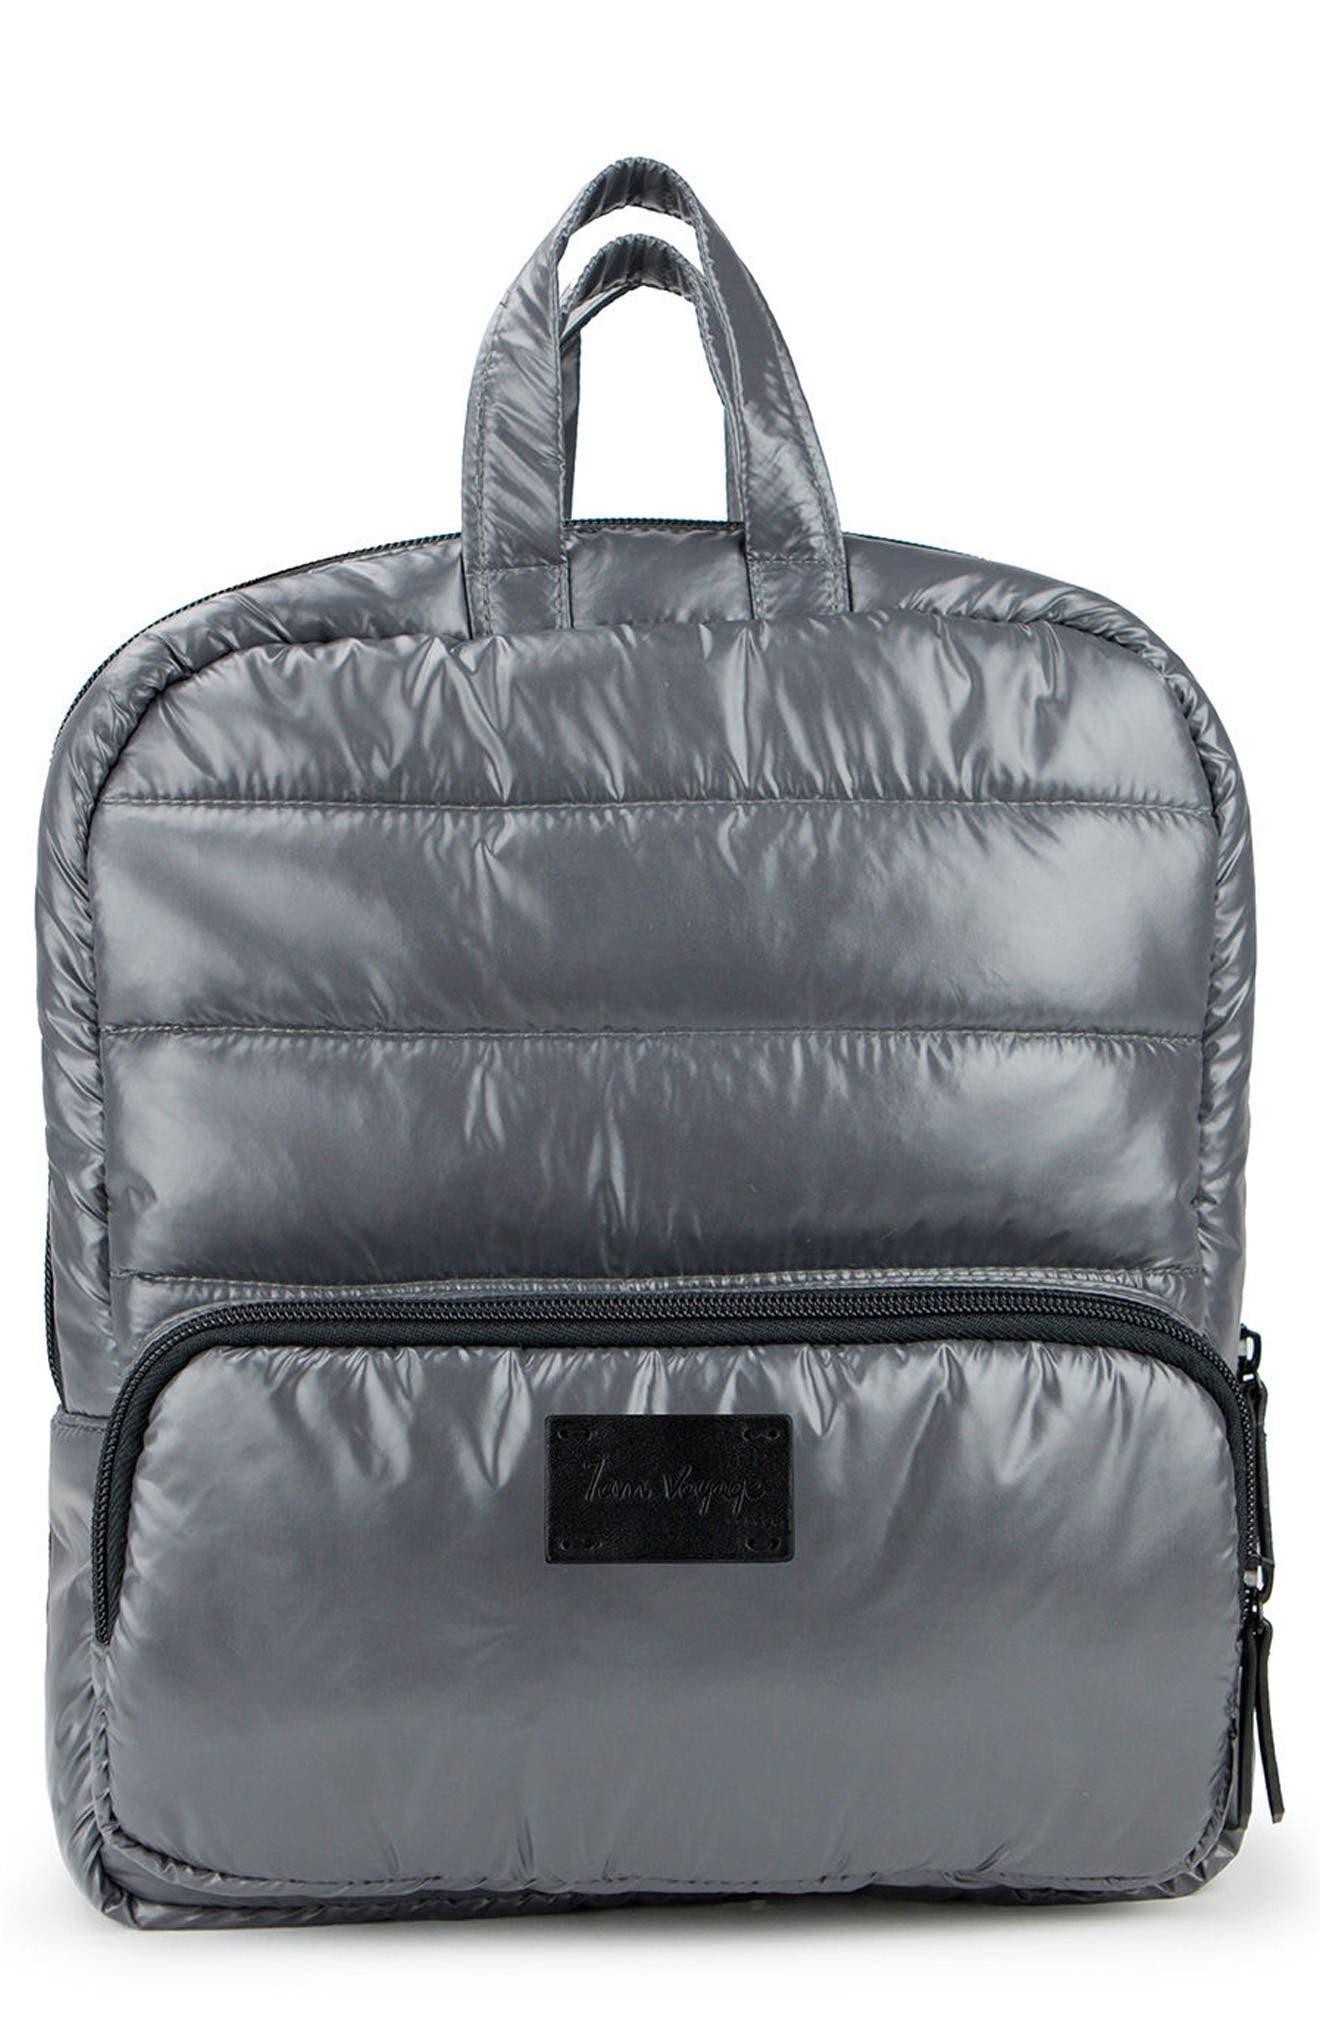 Mini Water Repellent Backpack,                             Main thumbnail 1, color,                             Graphite